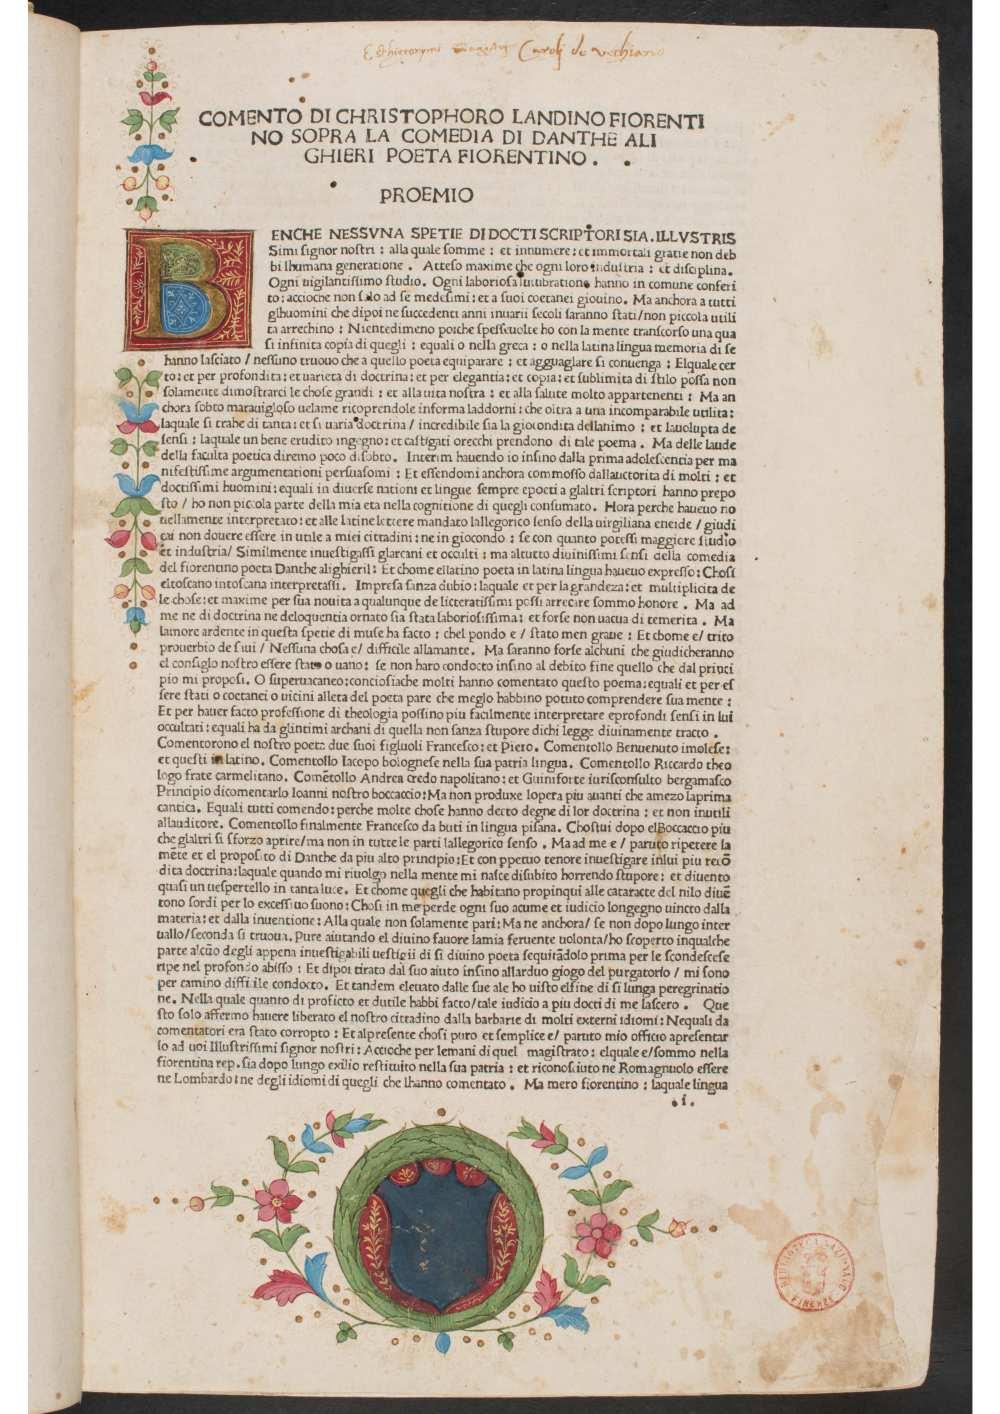 Firenze, Biblioteca Nazionale Centrale: Banco Rari 12. A kép forrása: Internet Archive https://archive.org/details/b.-r.-12_202101/page/n8/mode/1up